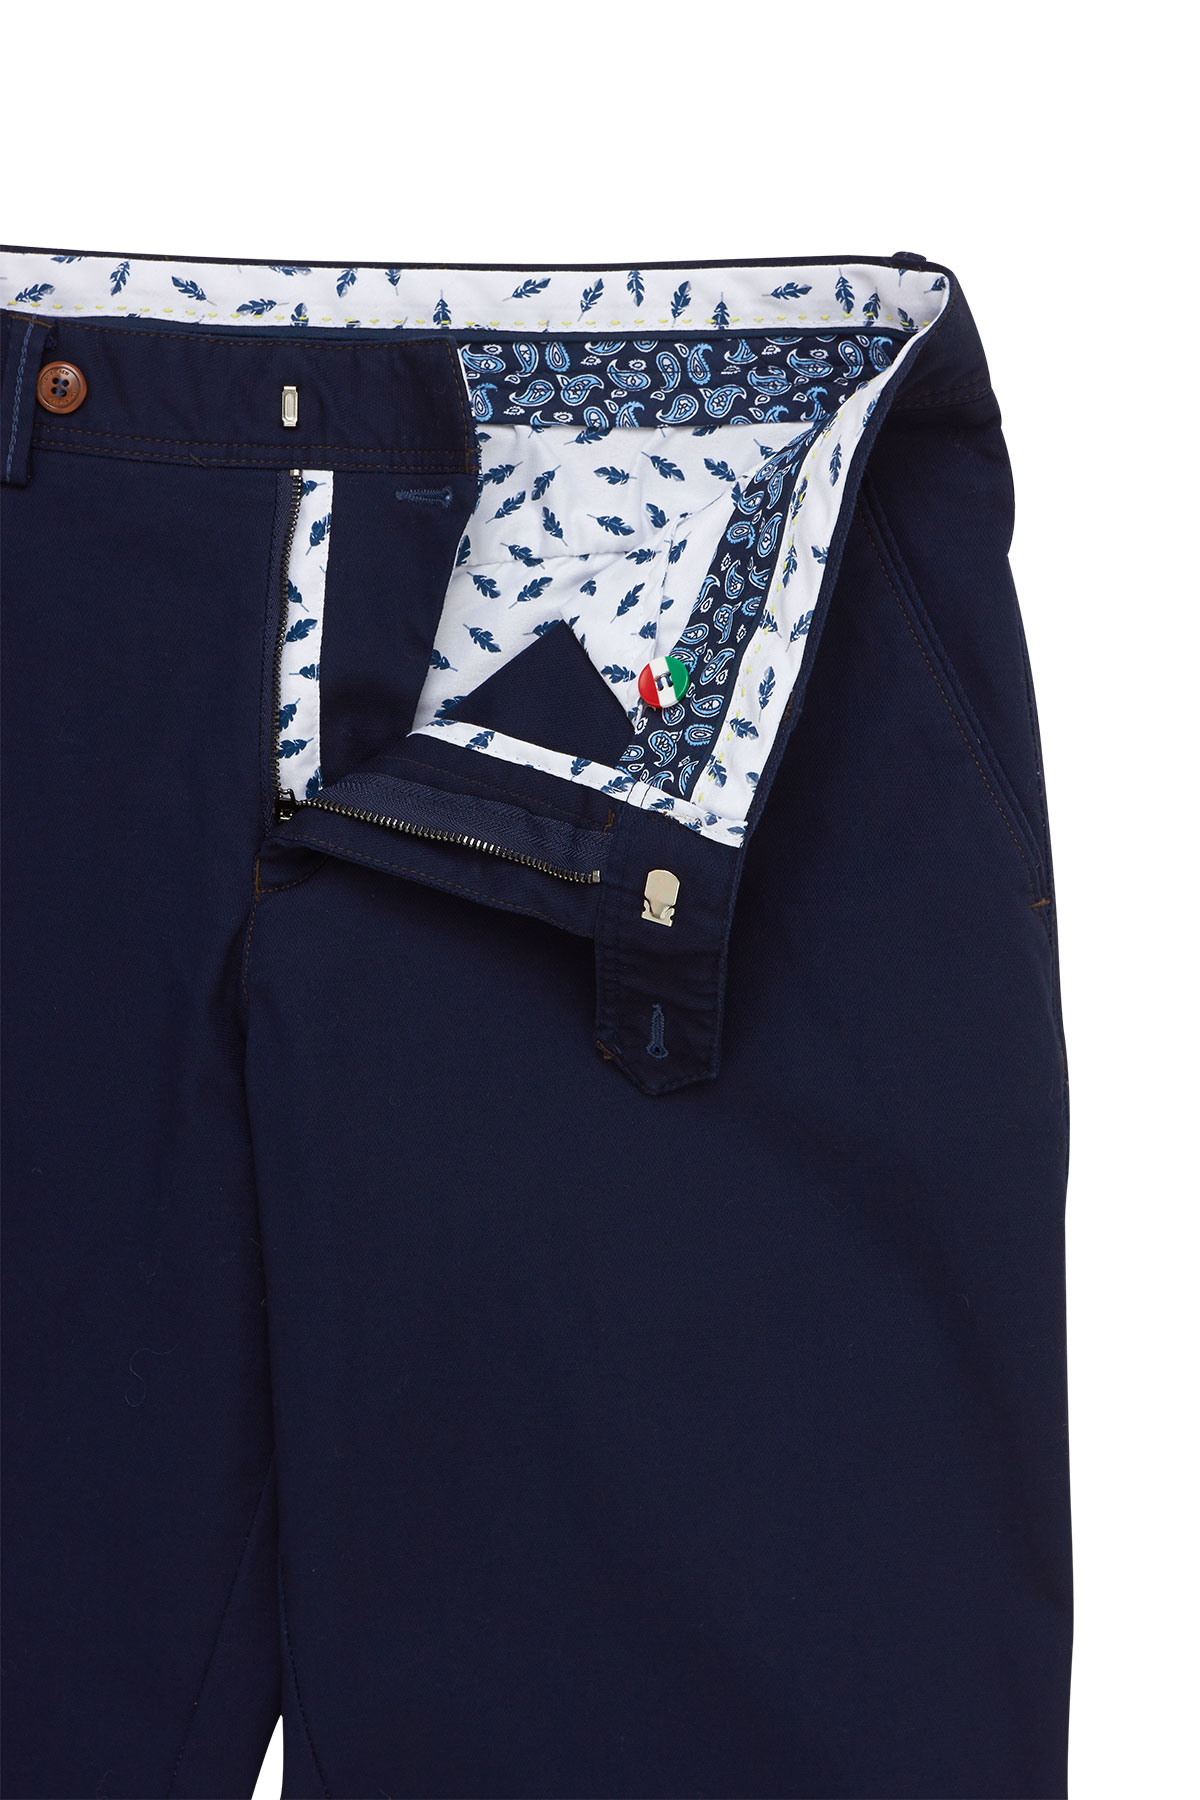 Брюки «chinos» синего  цвета 18505 JAZZ